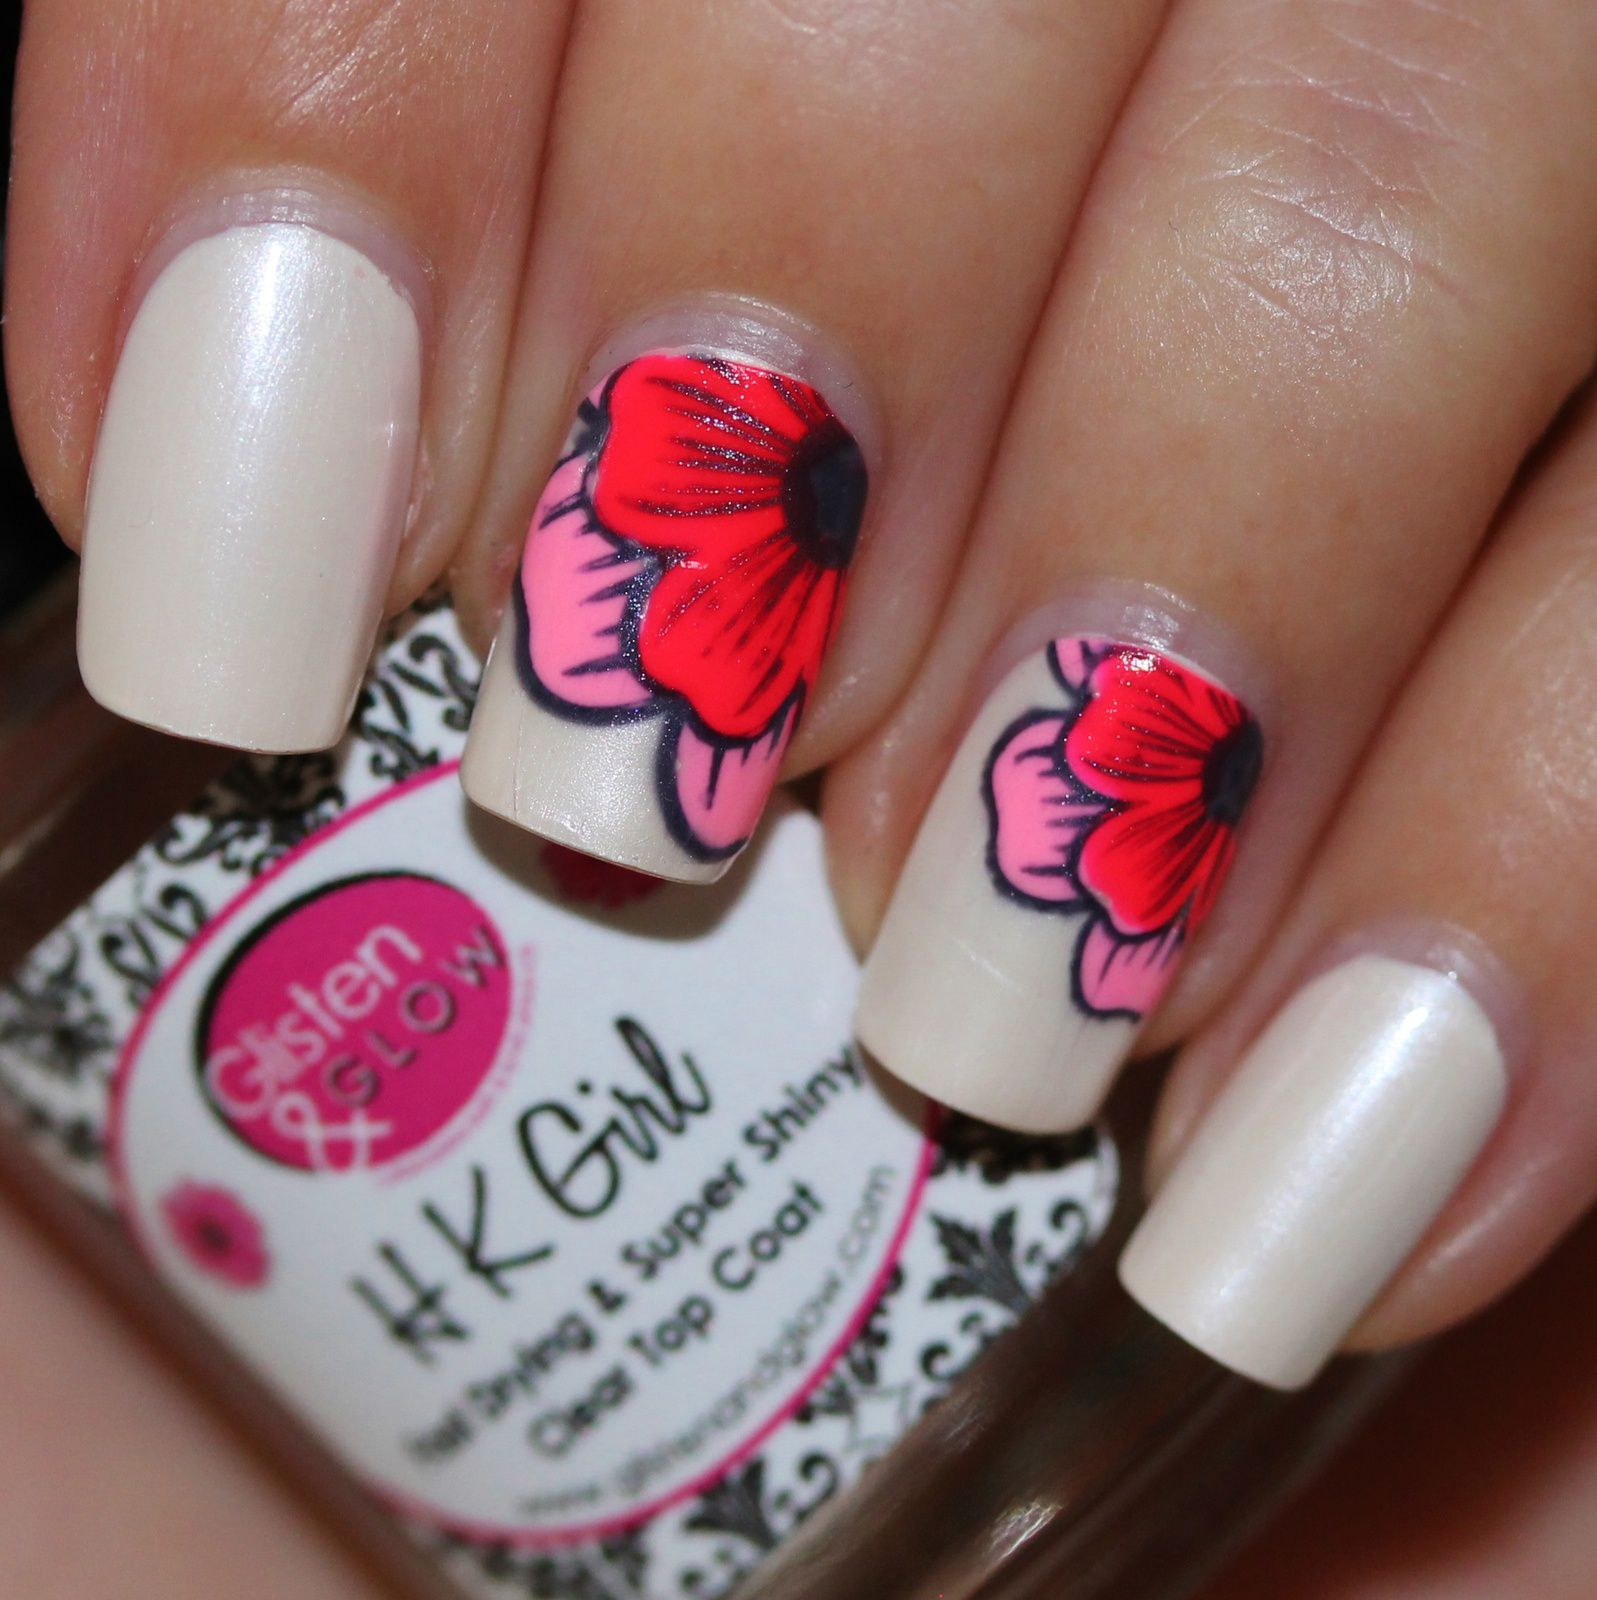 Essie Protein Base Coat / Color Club Heirloom Pearls / Stampink Plate Winstonia W-04 & Konad black Stamping Polish / PolishMeToGo Pretty Girls & Serum N°5 Pink Lantern / HK Girl Top Coat